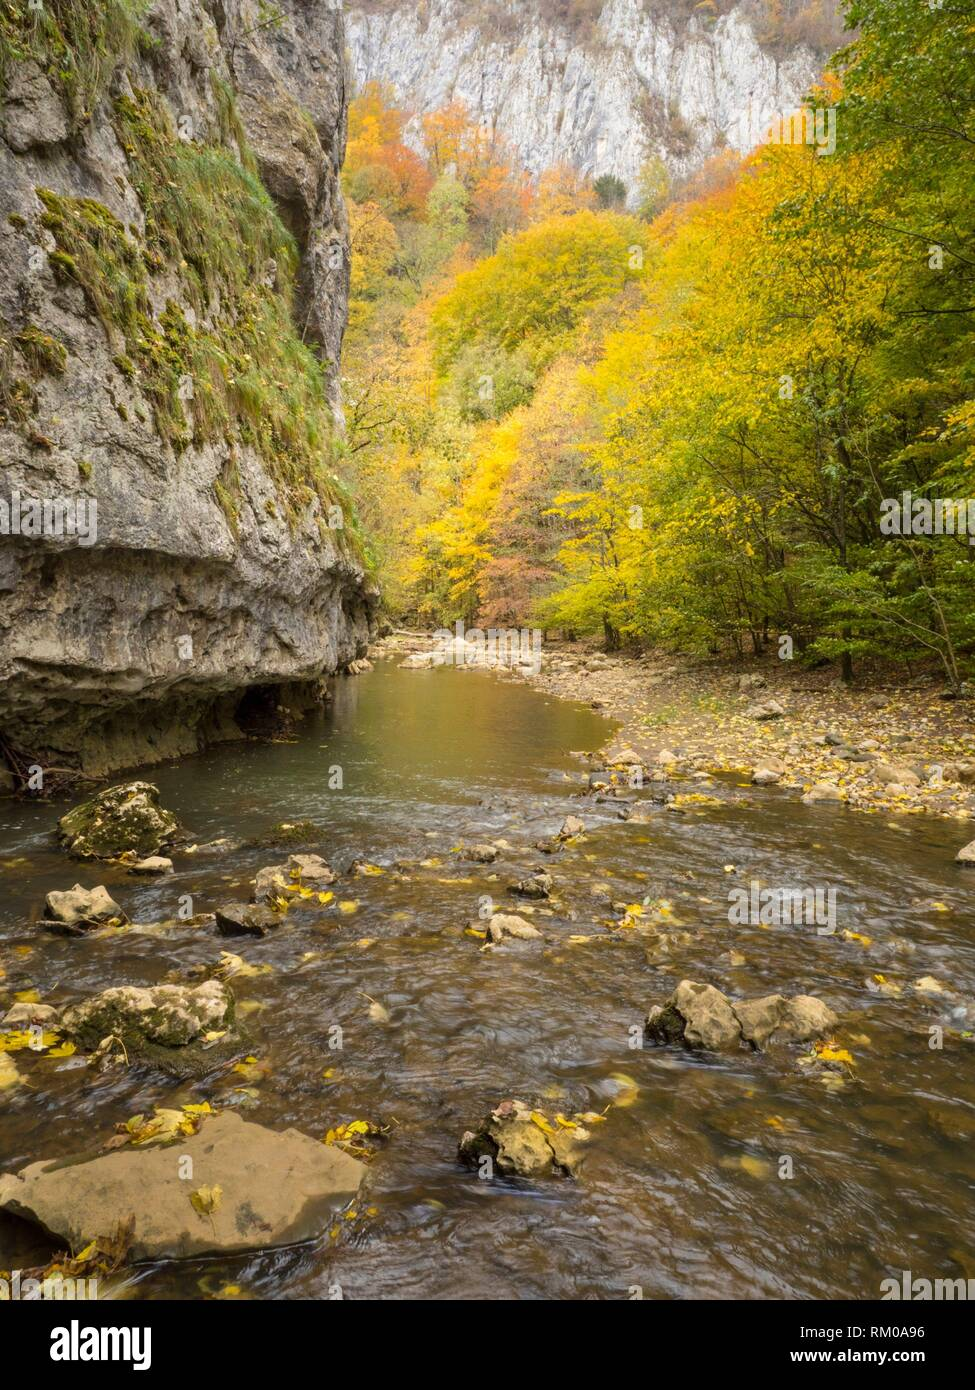 Transylvania, Romania, Scenic. - Stock Image